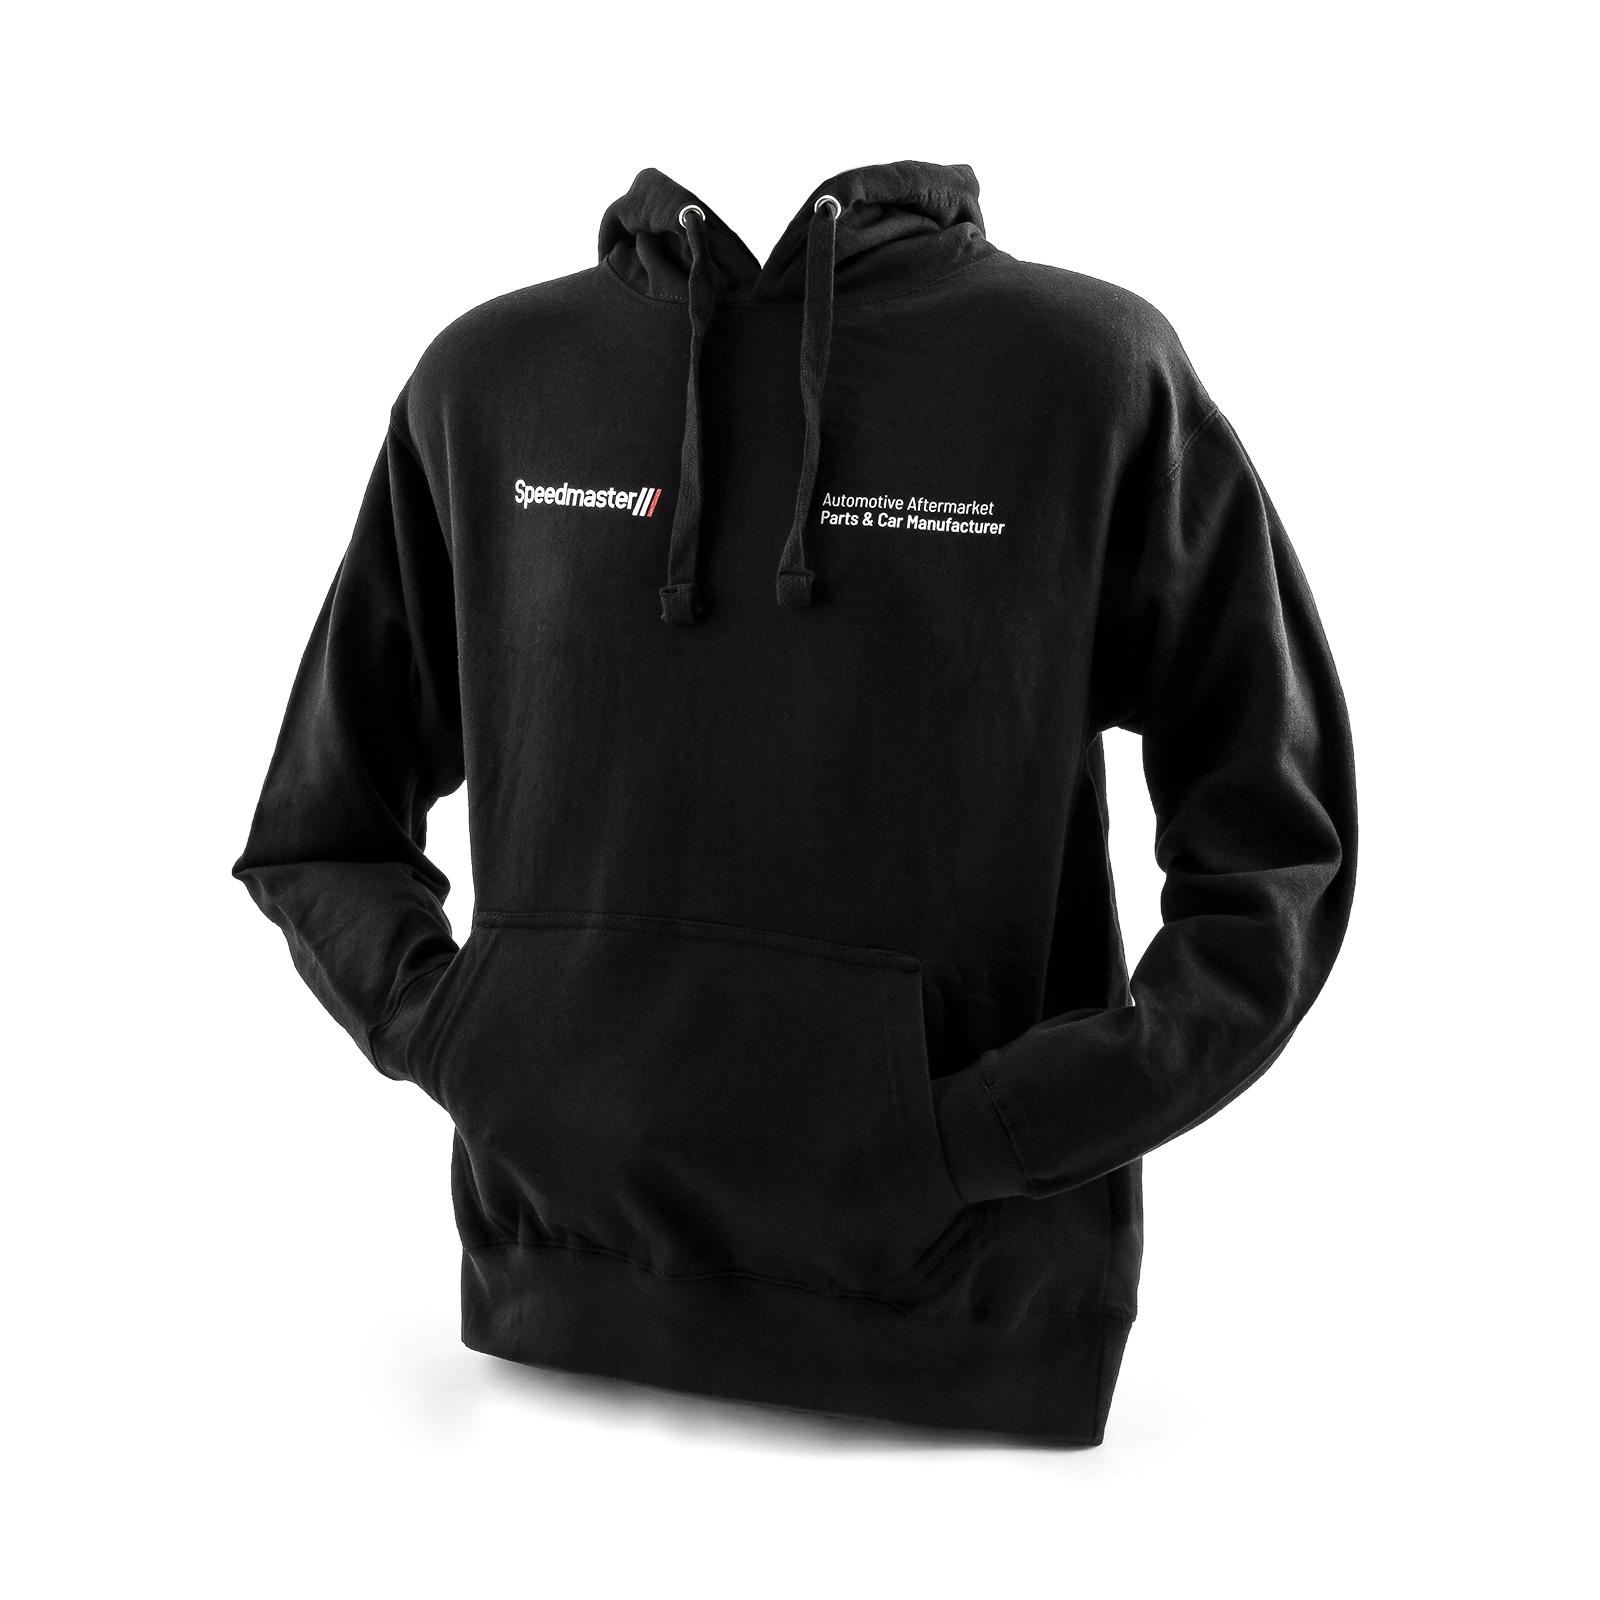 NEW LOGO Speedmaster Hooded Sweatshirt Hoodie - XXXL